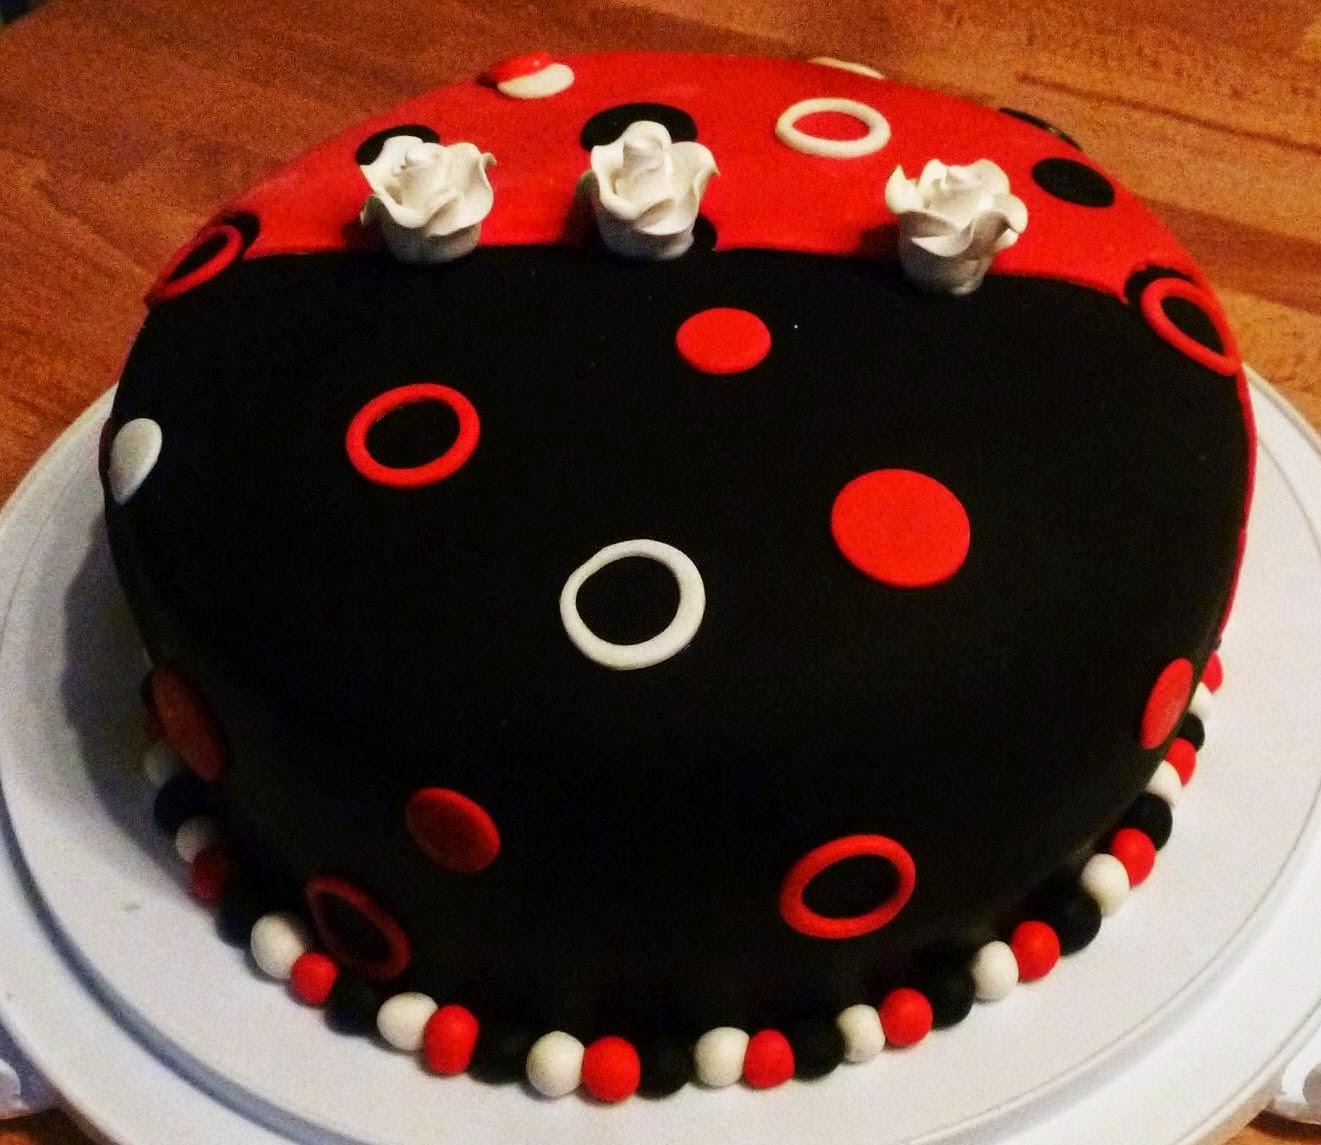 Black and Red Fondant Cake... Beetle inspiration